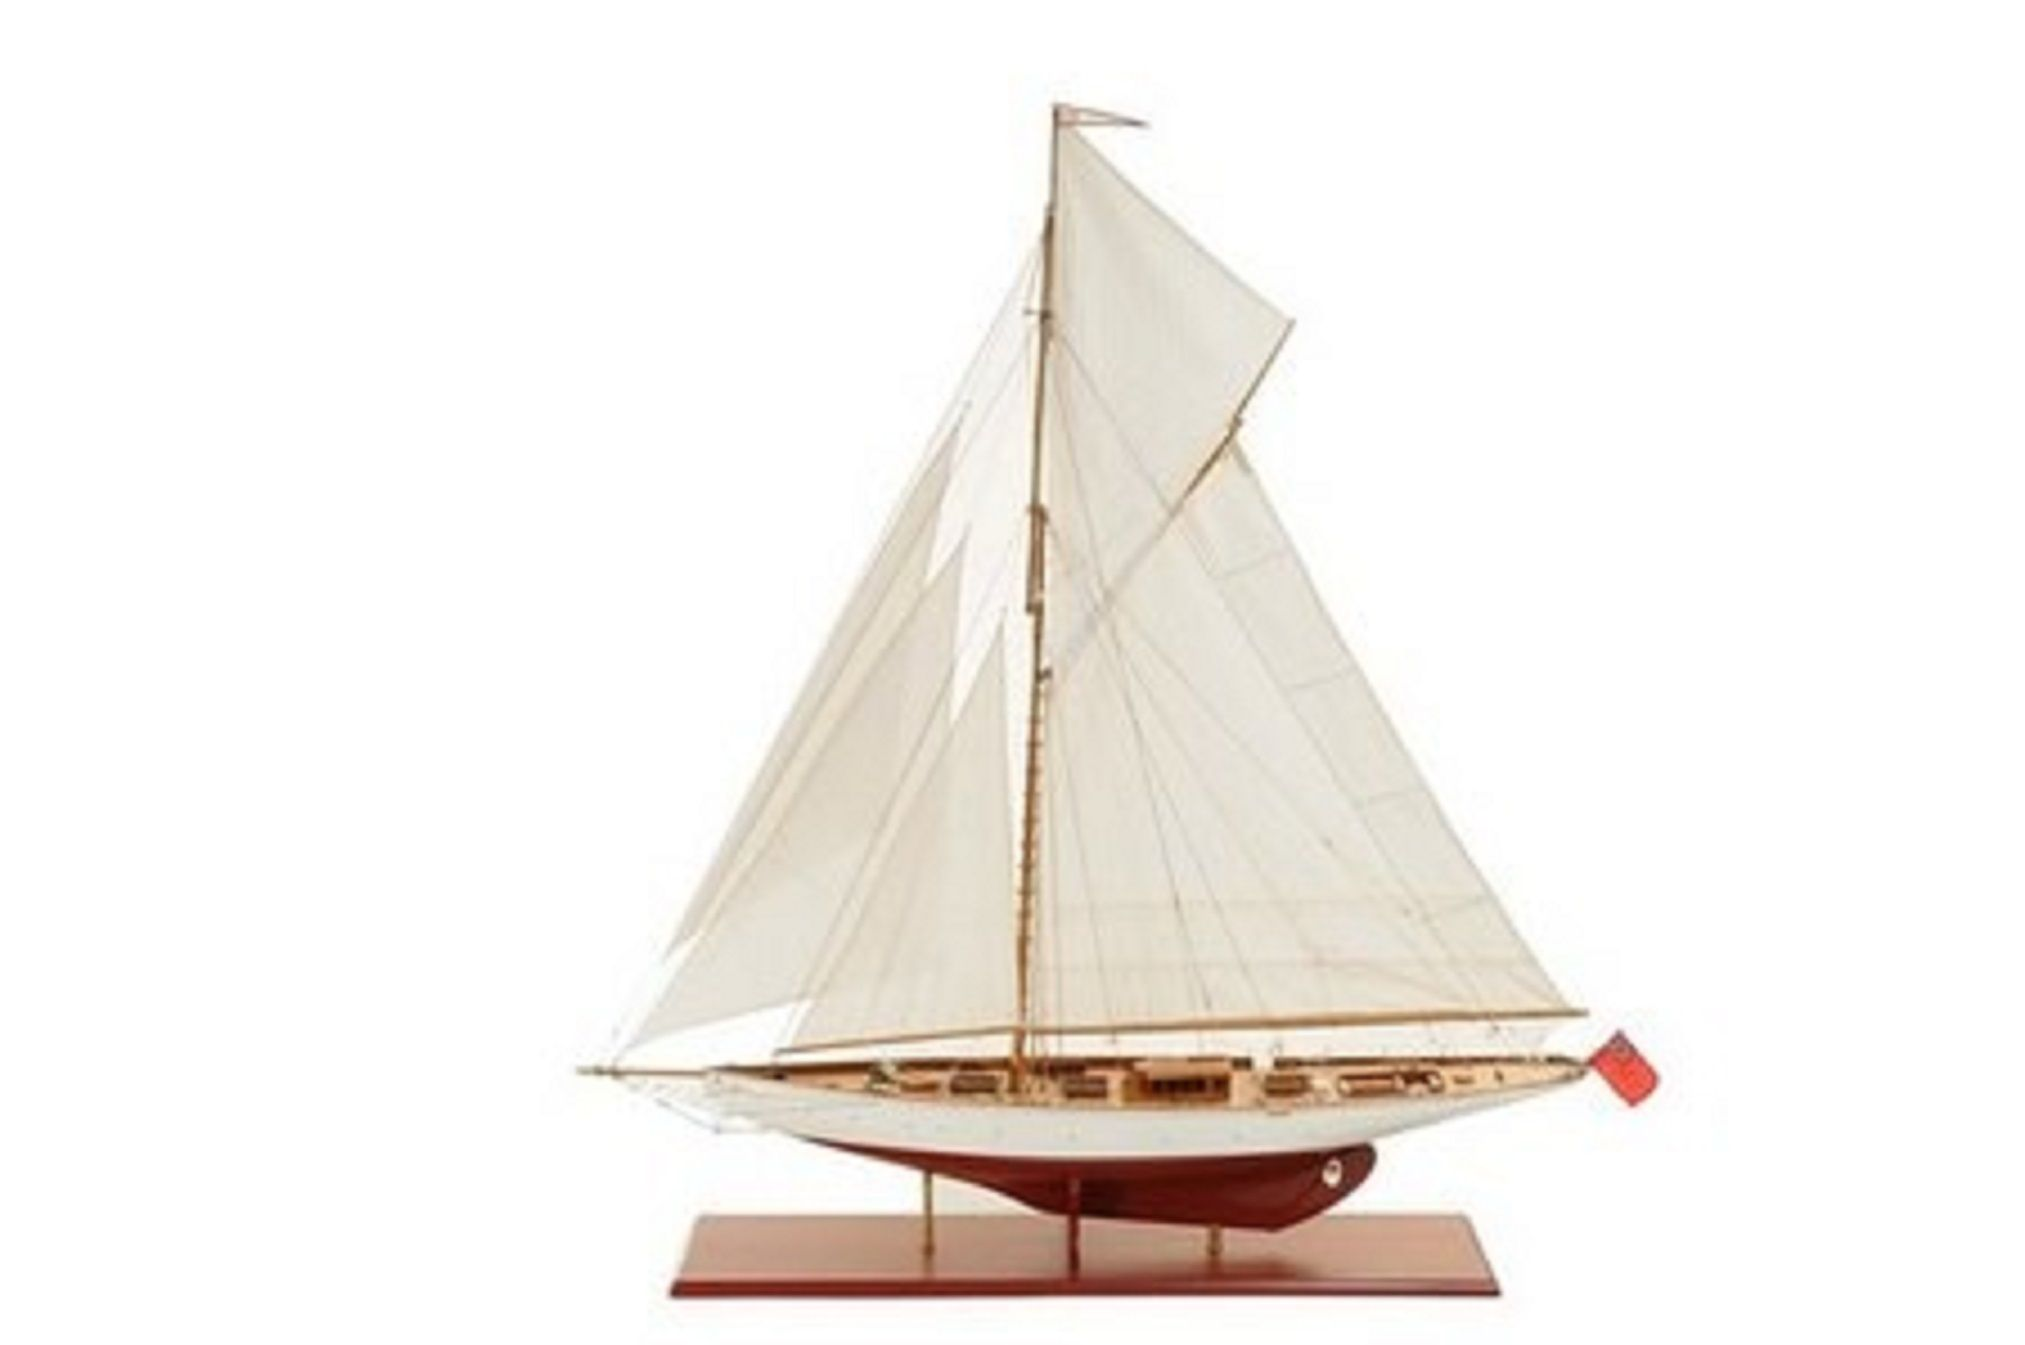 Merry Maid Model Yacht